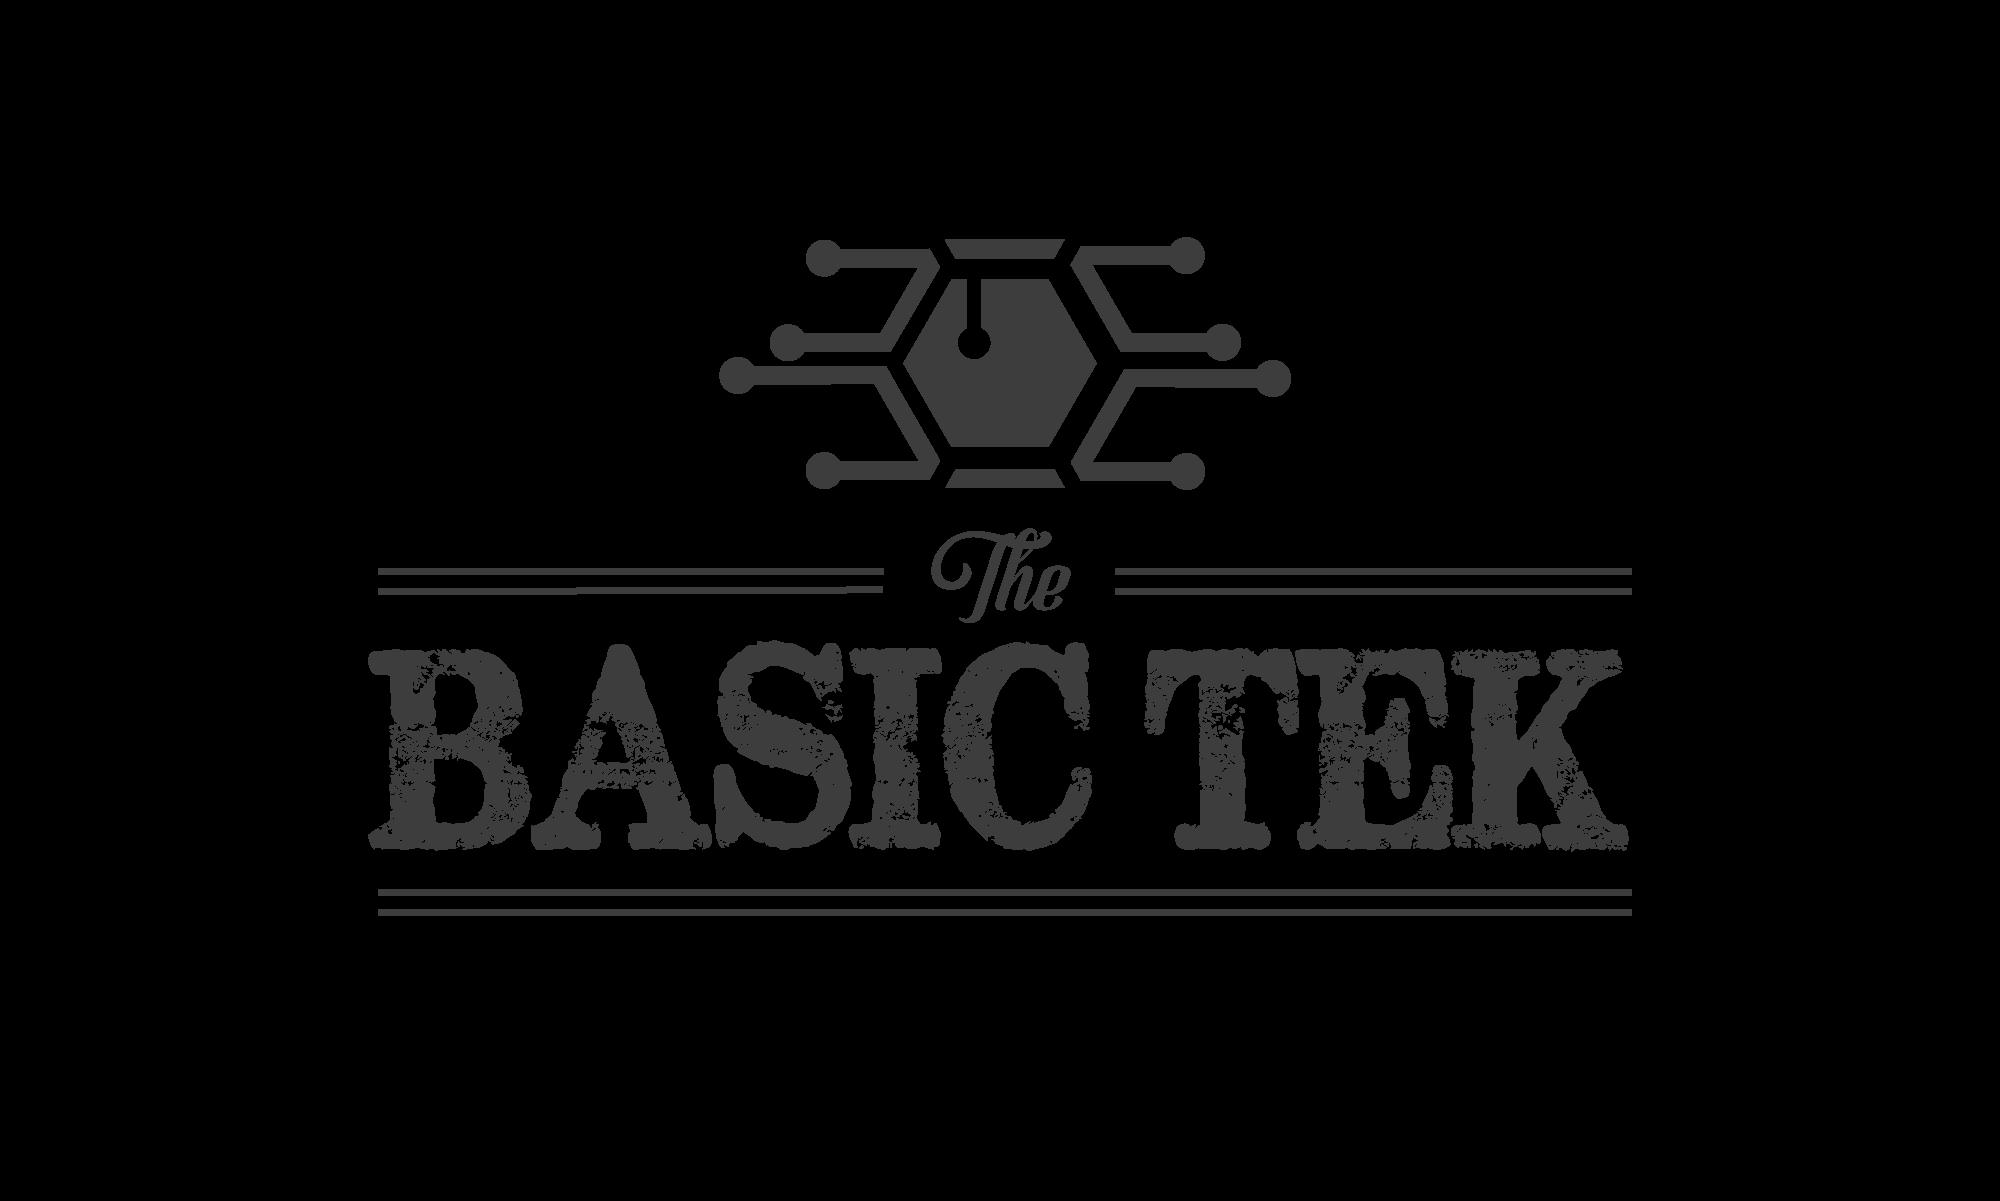 A Basic Tech blog